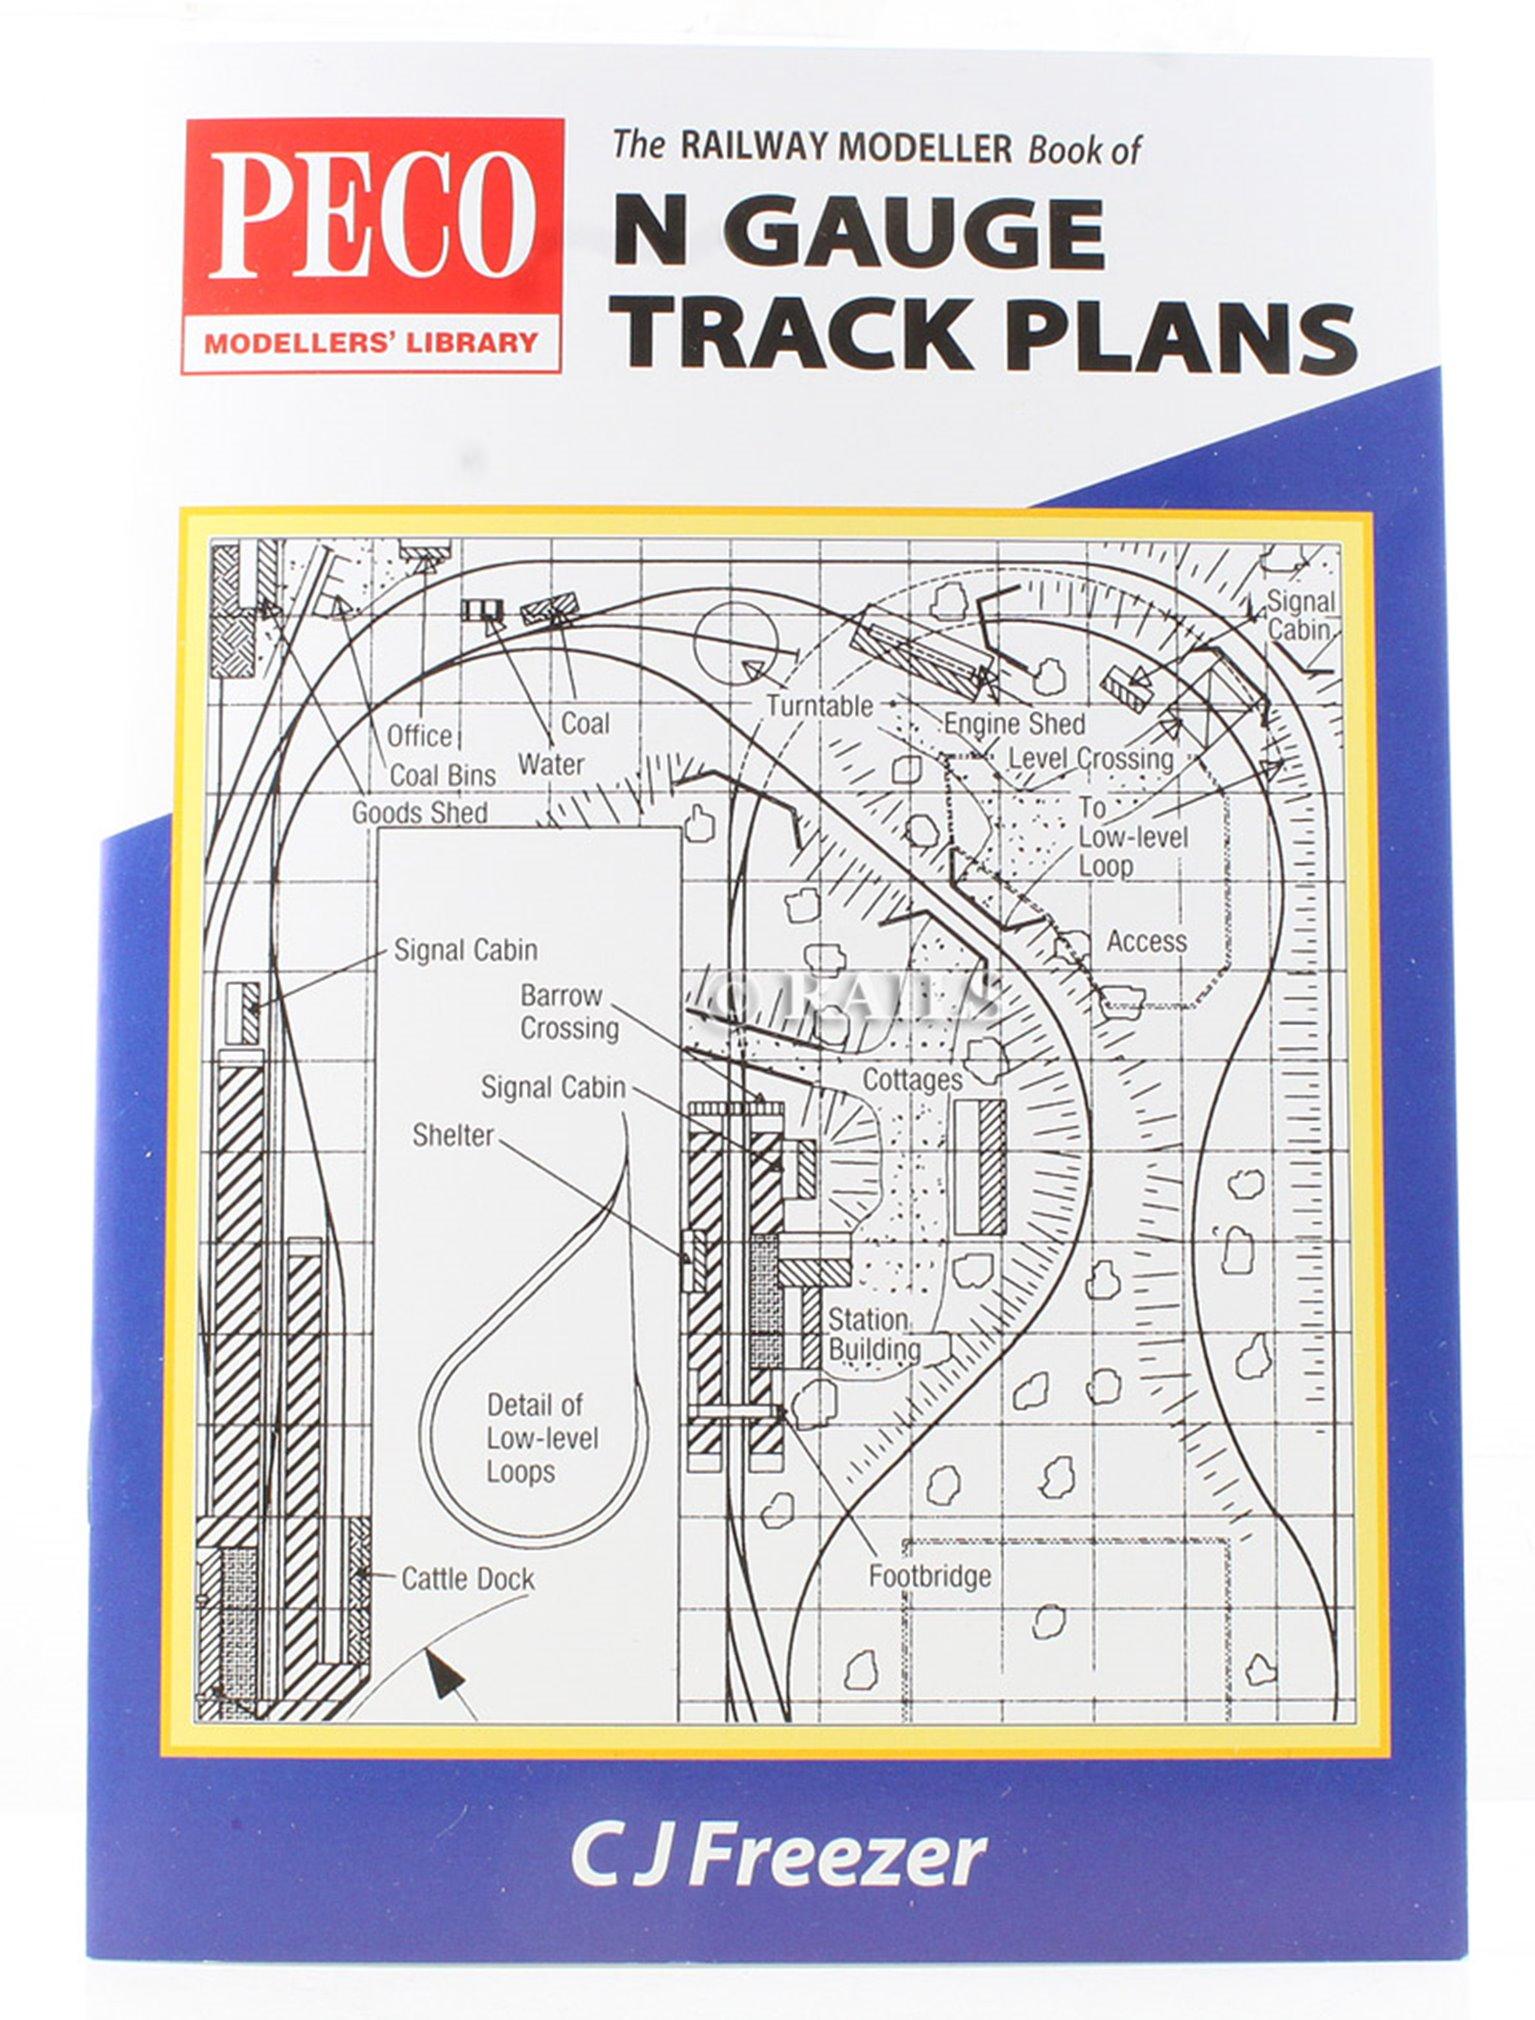 The Railway Modeller Book of N Gauge Track Plans